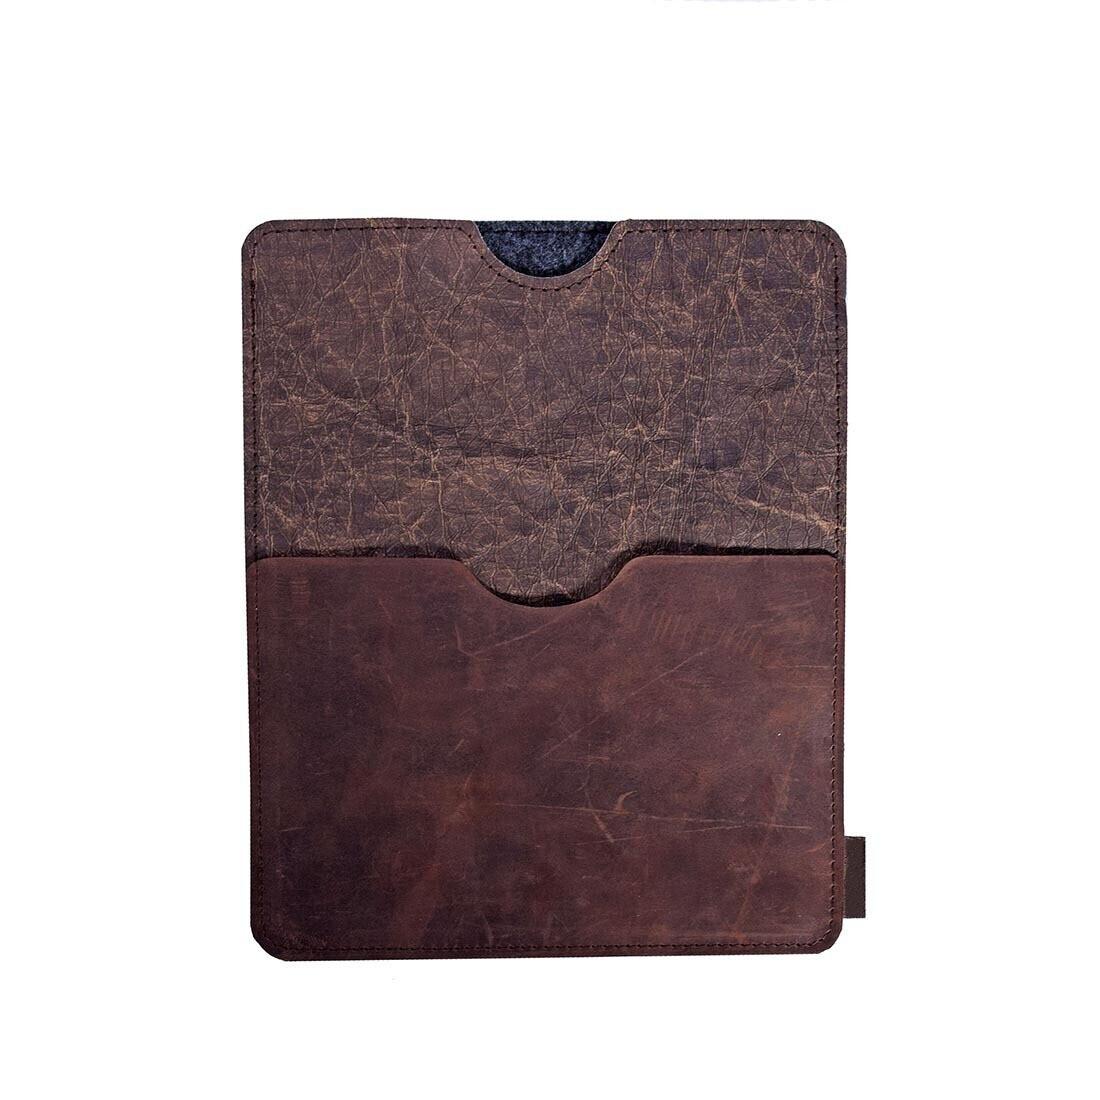 Tablet-Tasche Marcel